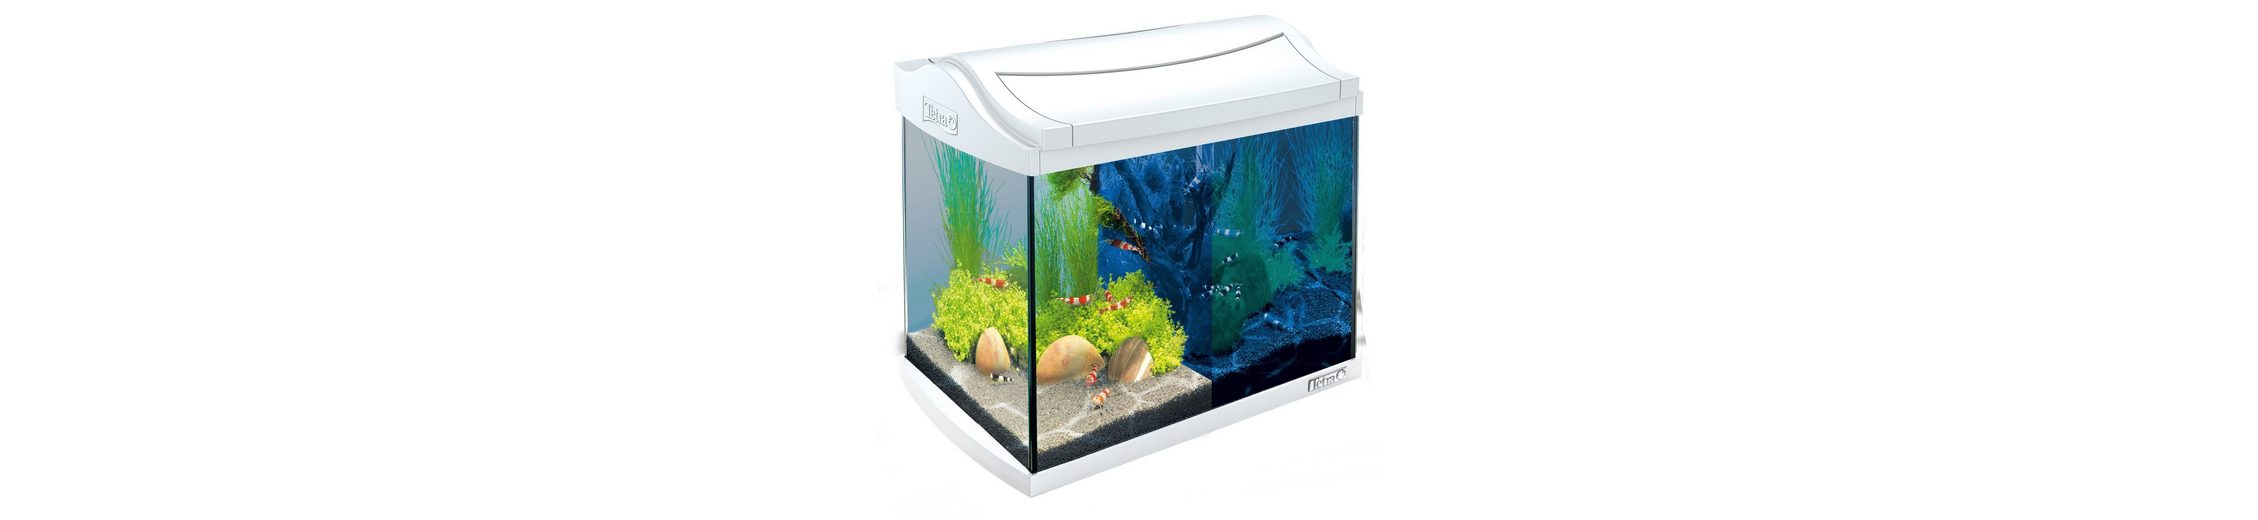 Aquarium »AquaArt LED Discovery Line« 20 l, weiß